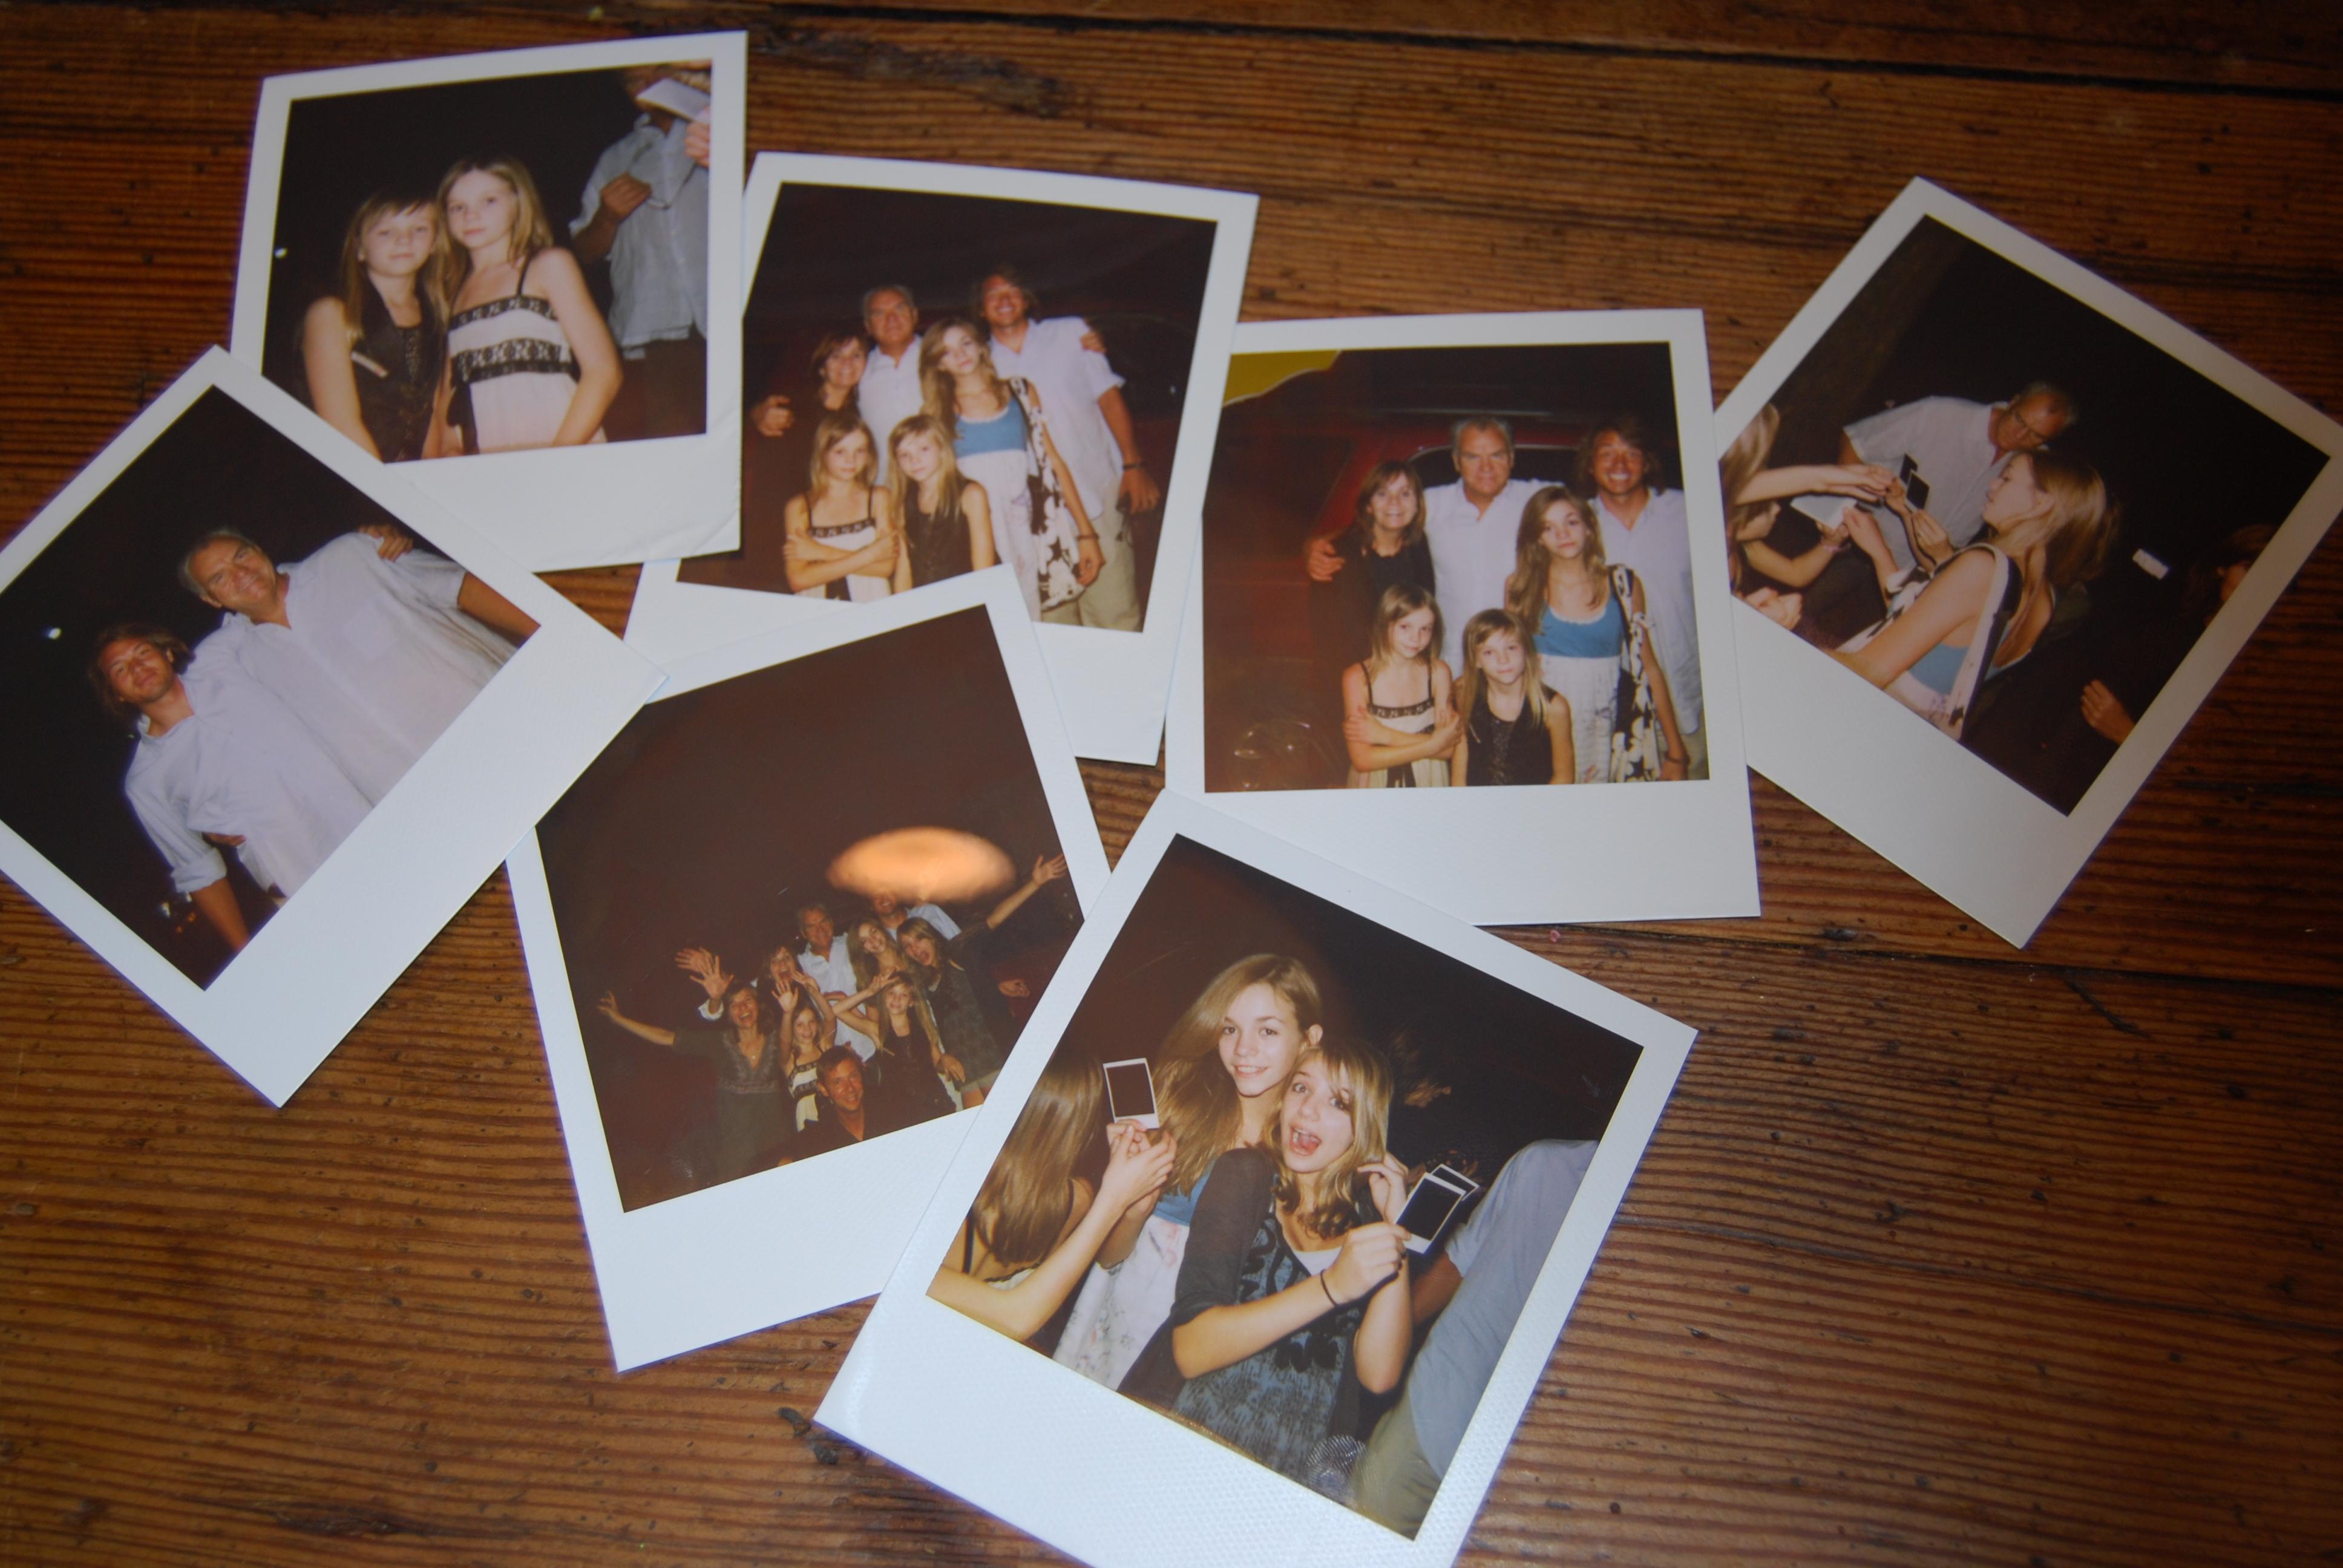 party polaroid pix by mikey